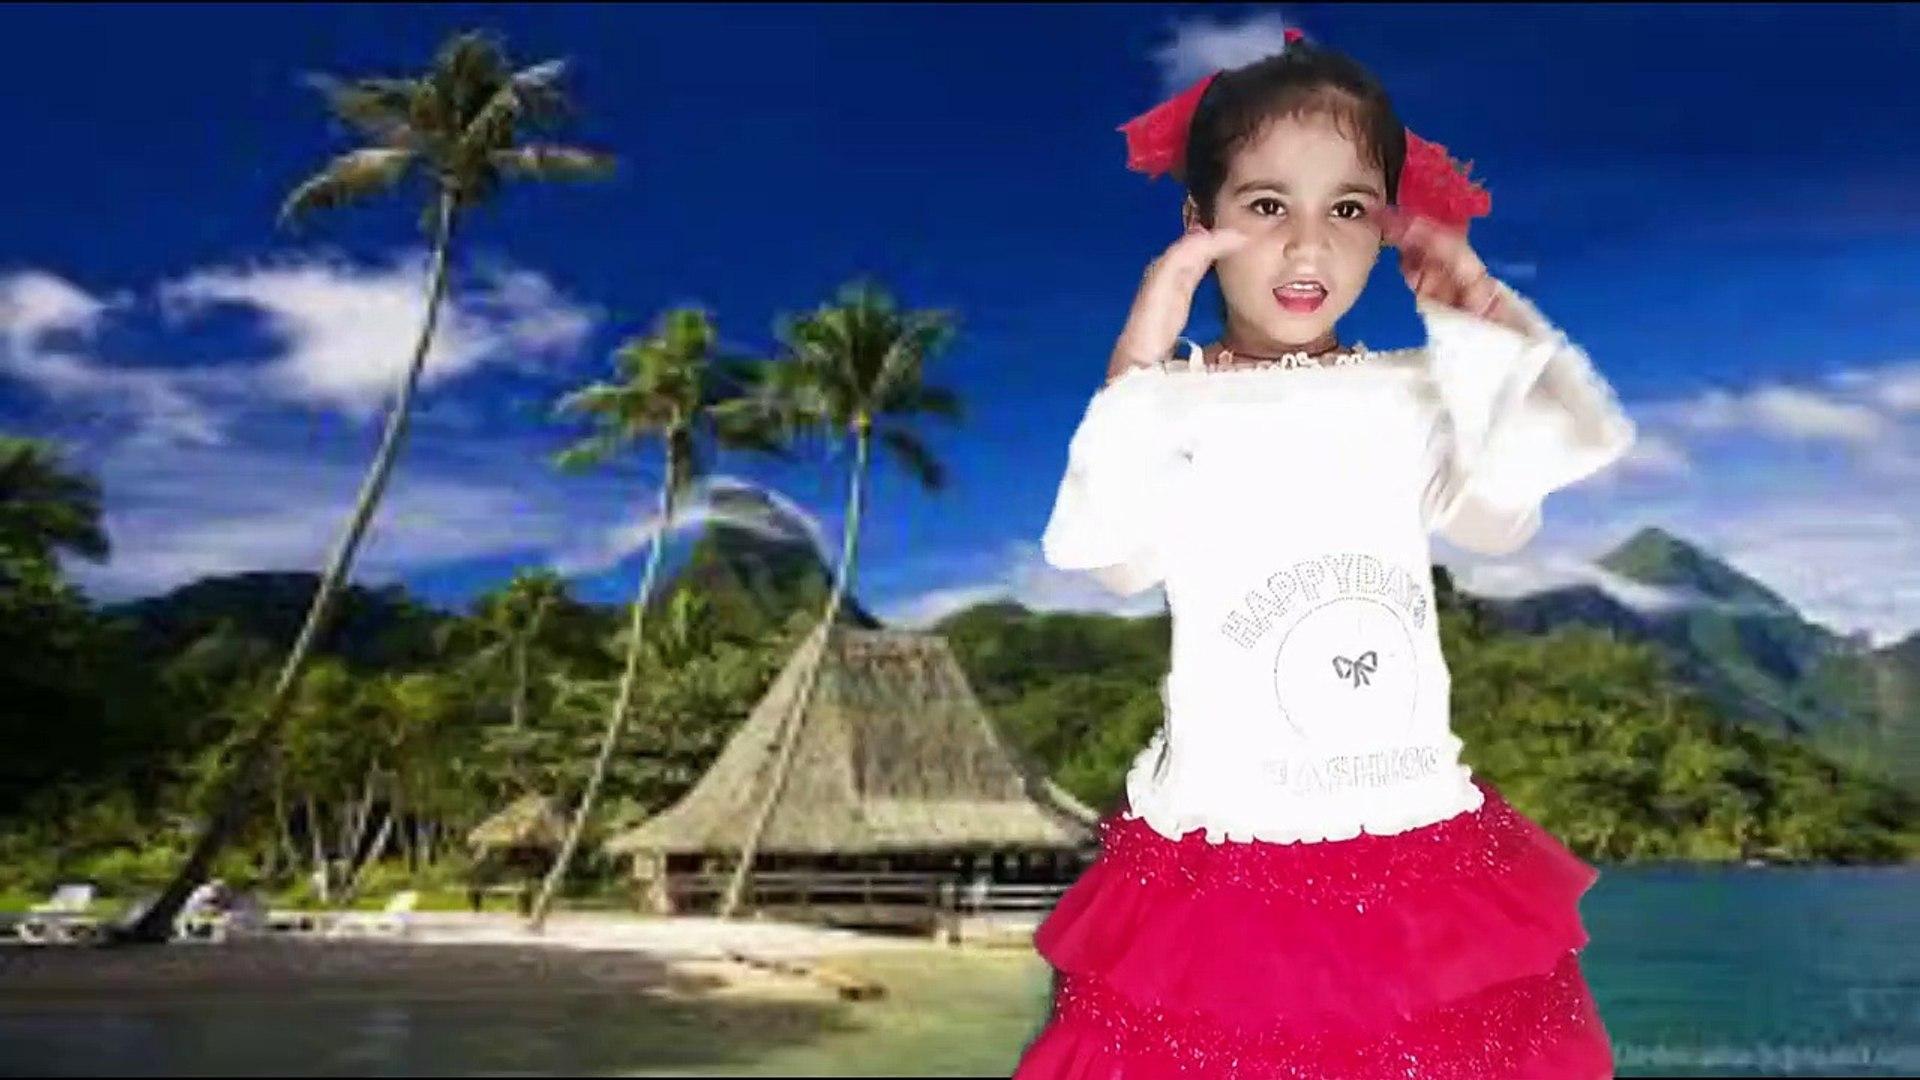 ALLIGATOR # KG1 POEM# KIDS ACTIVITY# 4 YEAR KIDS # SHREEJA BARBUDHE